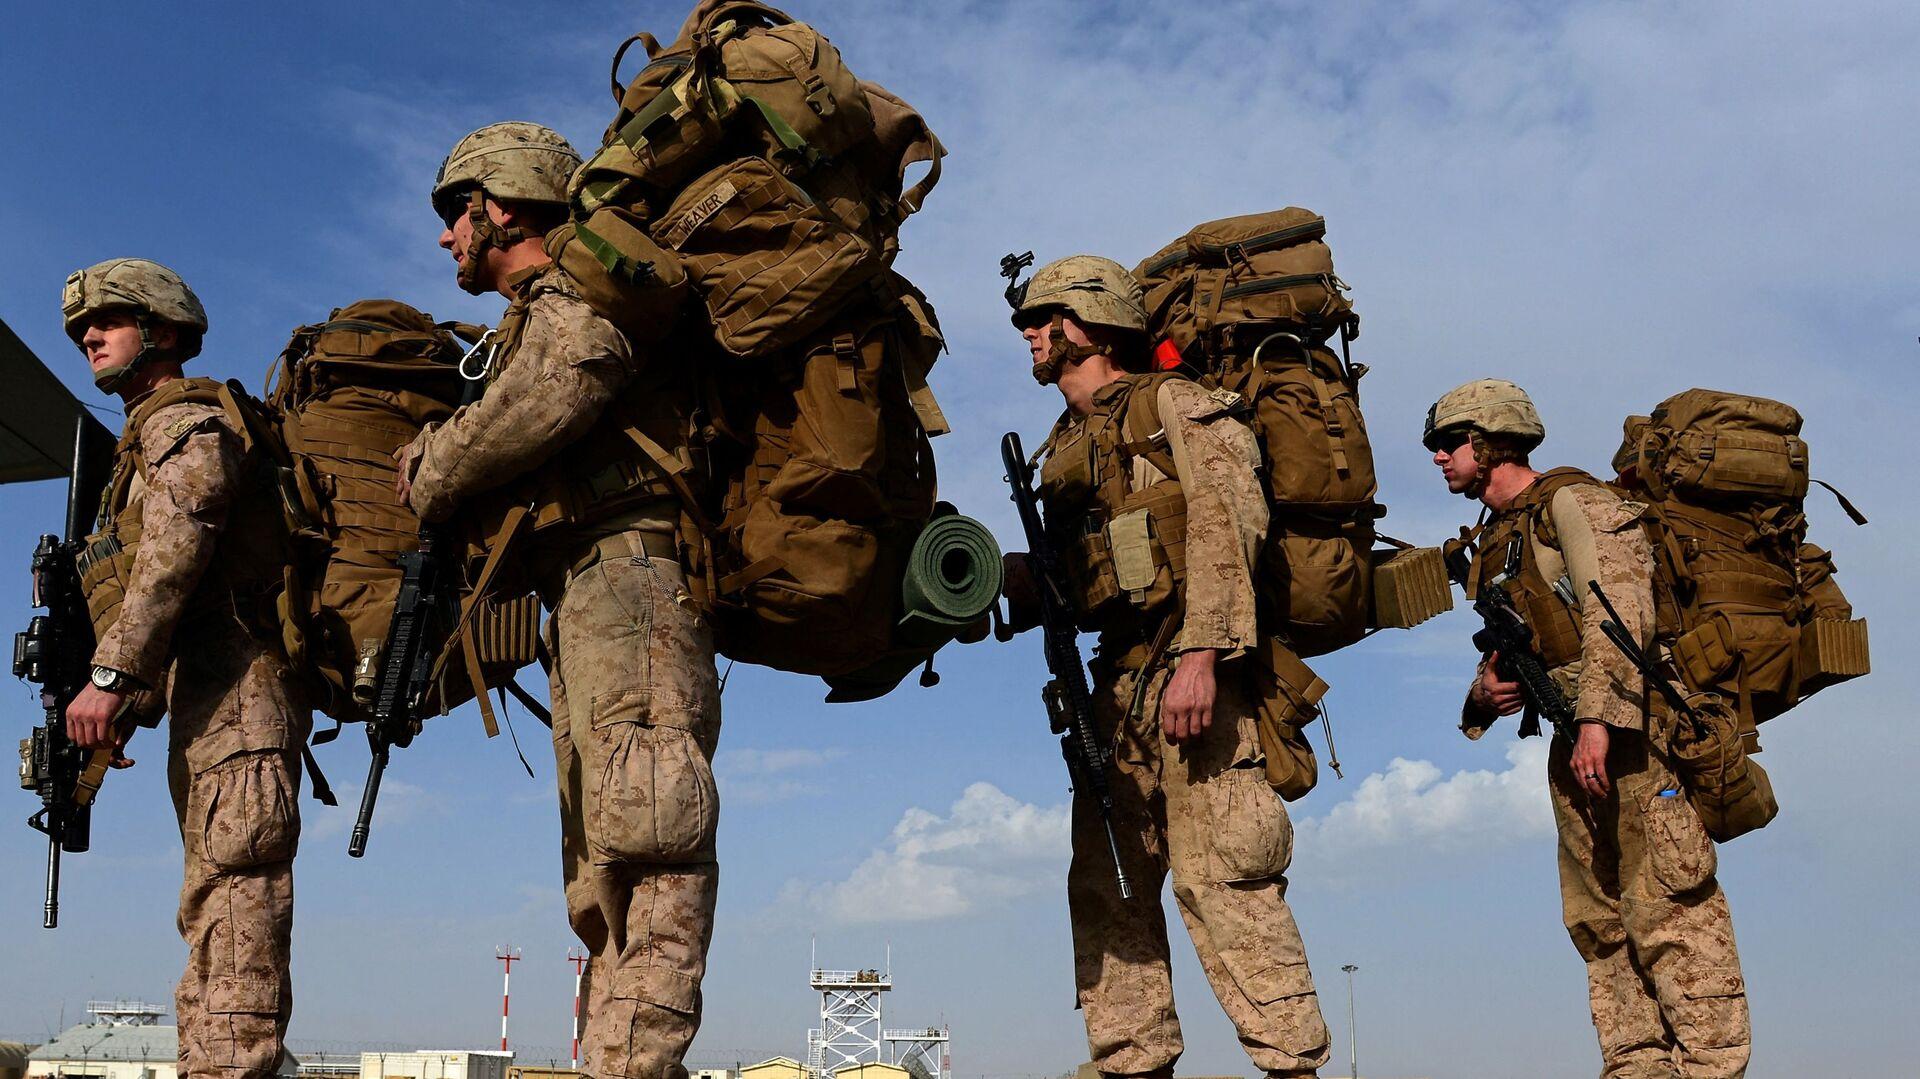 I Marines degli Stati Uniti in Afghanistan - Sputnik Italia, 1920, 13.06.2021